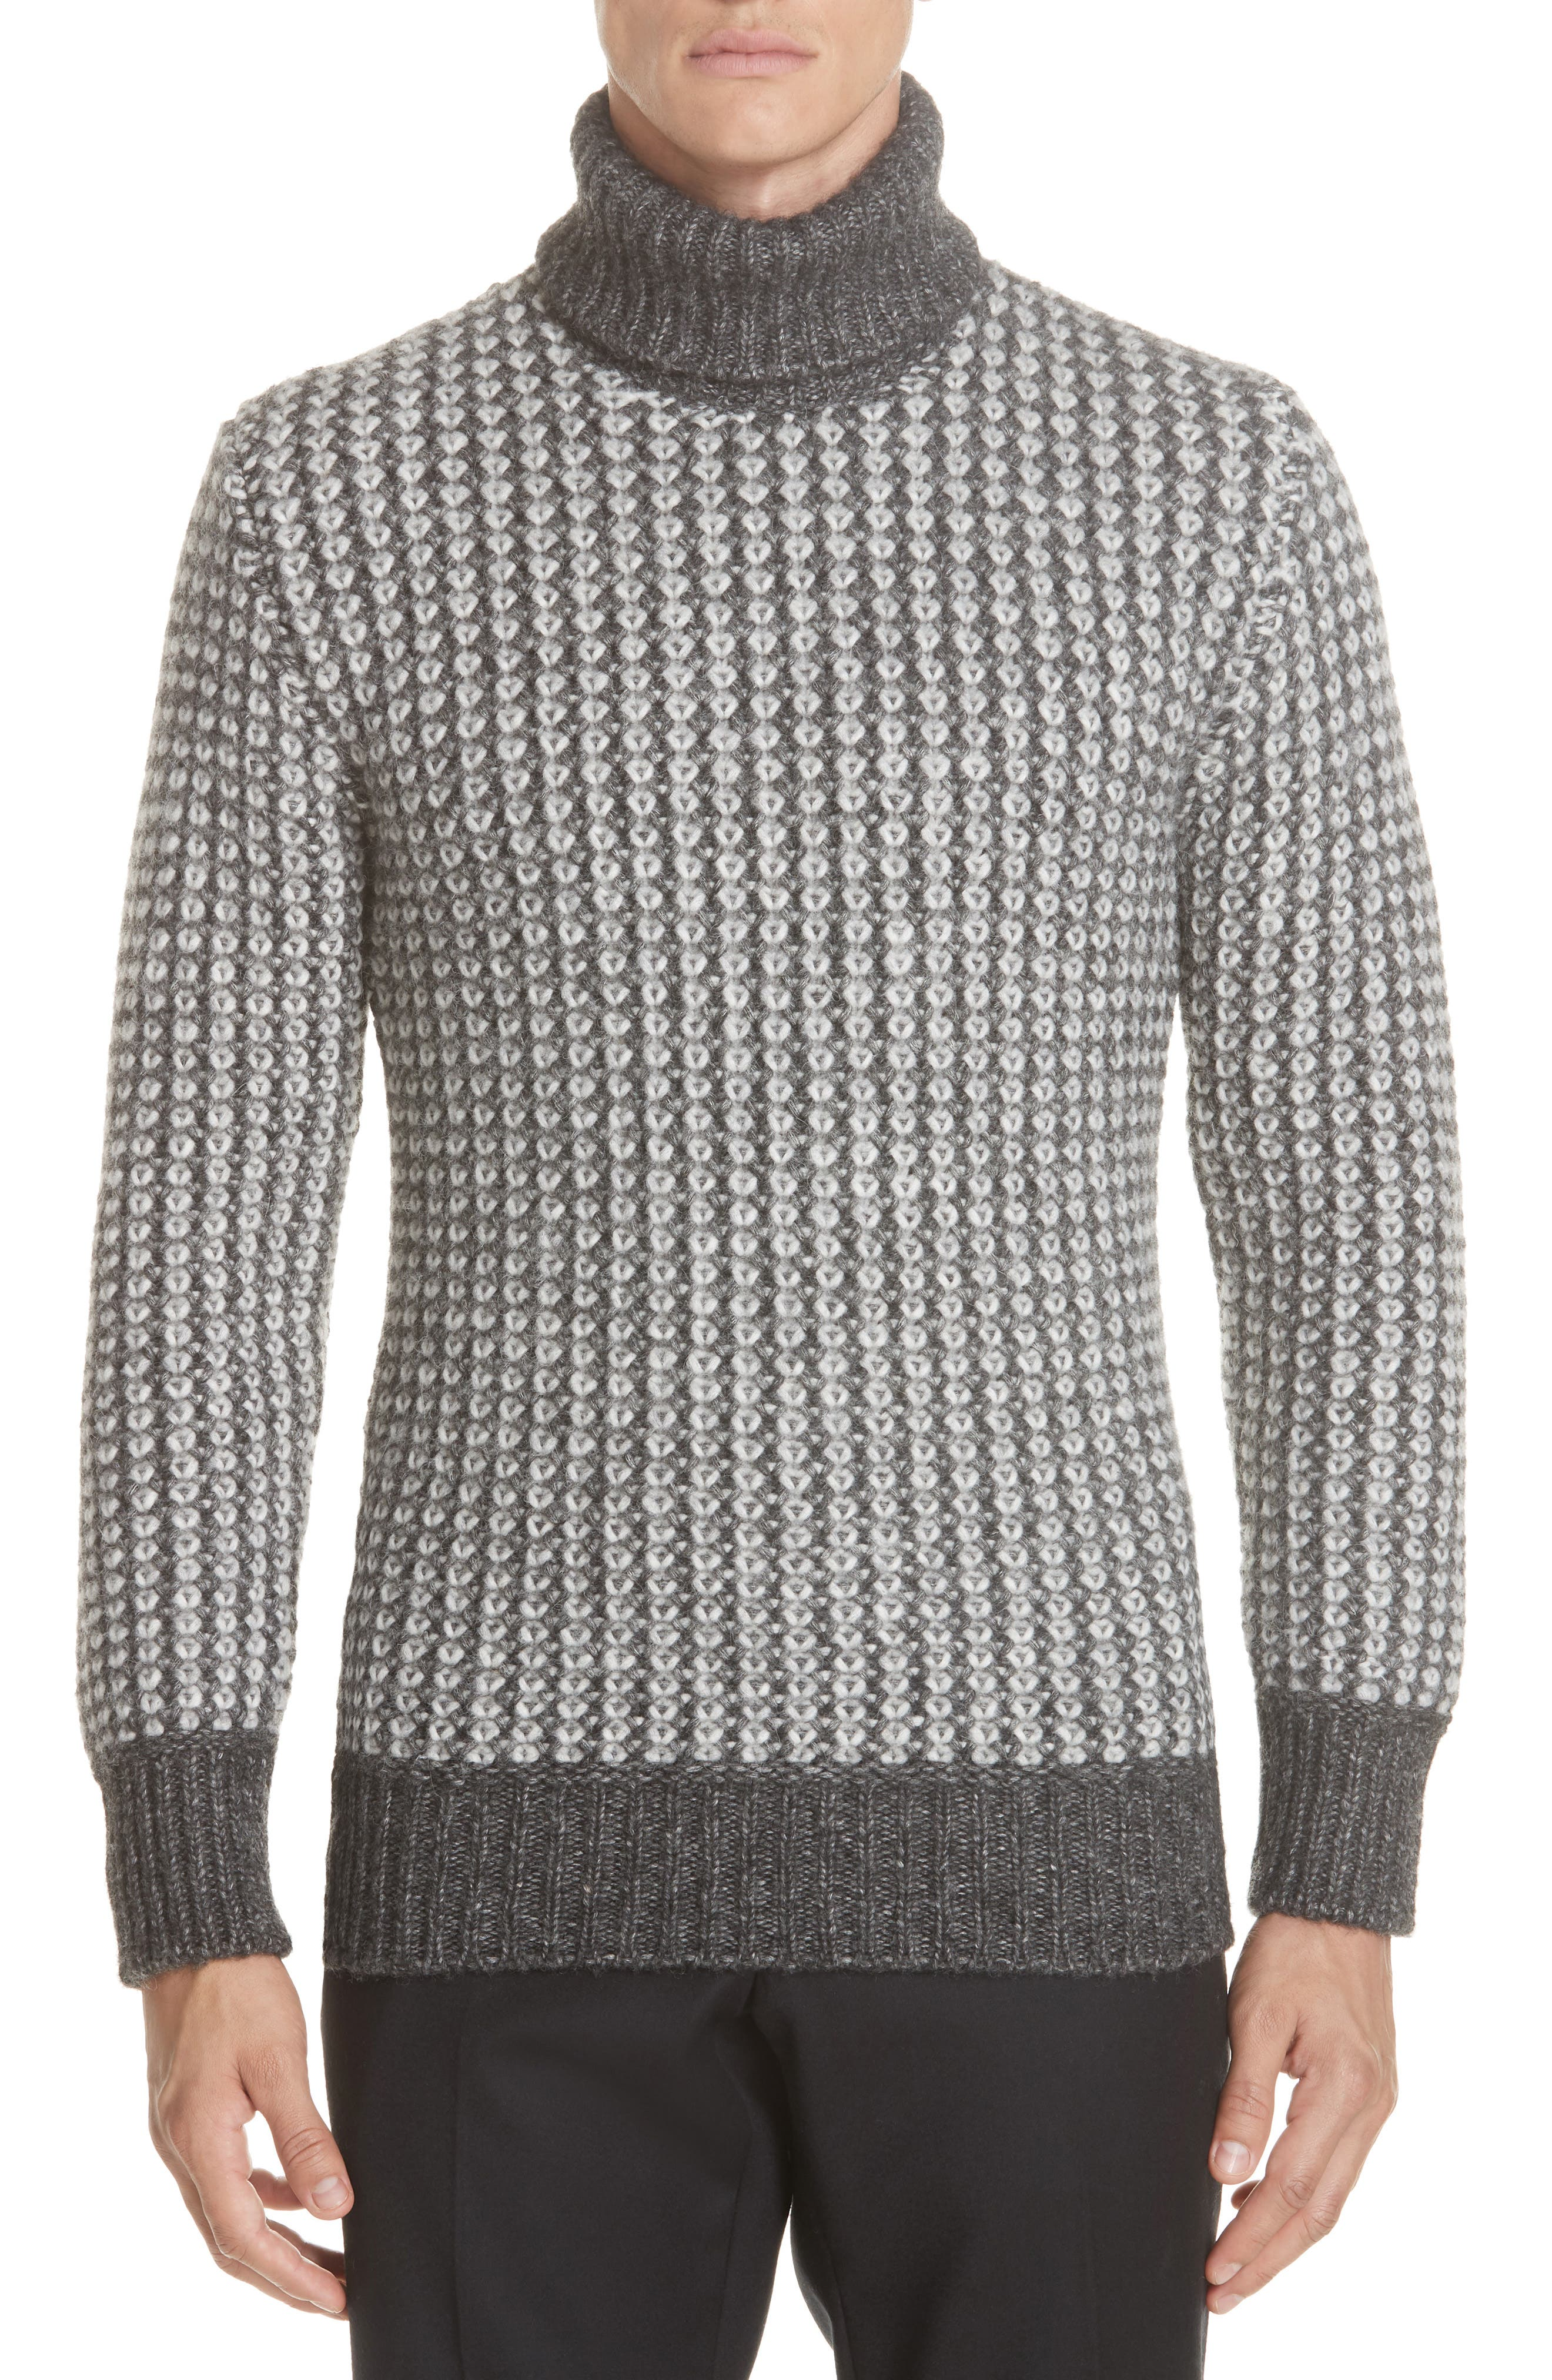 Cotton Blend Turtleneck Sweater,                         Main,                         color, GREY